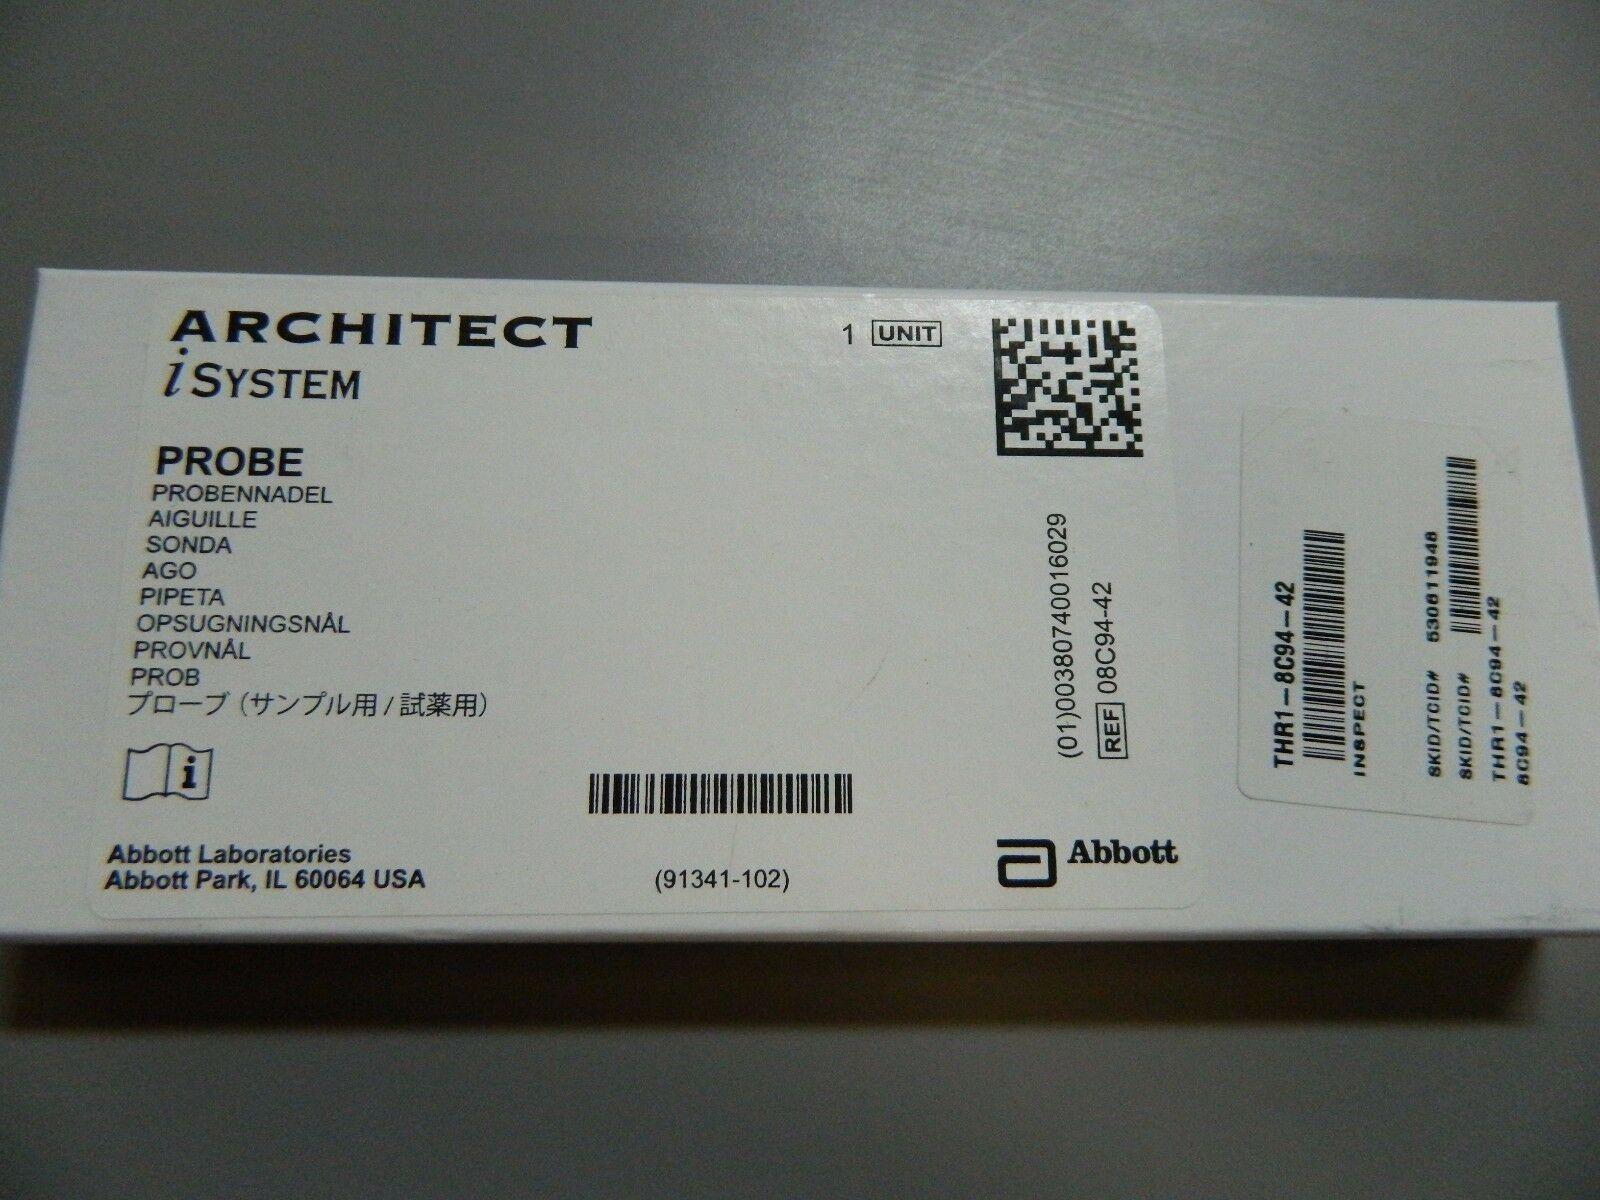 PROBE P/N 08C94-42 FOR ABBOTT ARCHITECT iSYSTEMS BRAND NEW